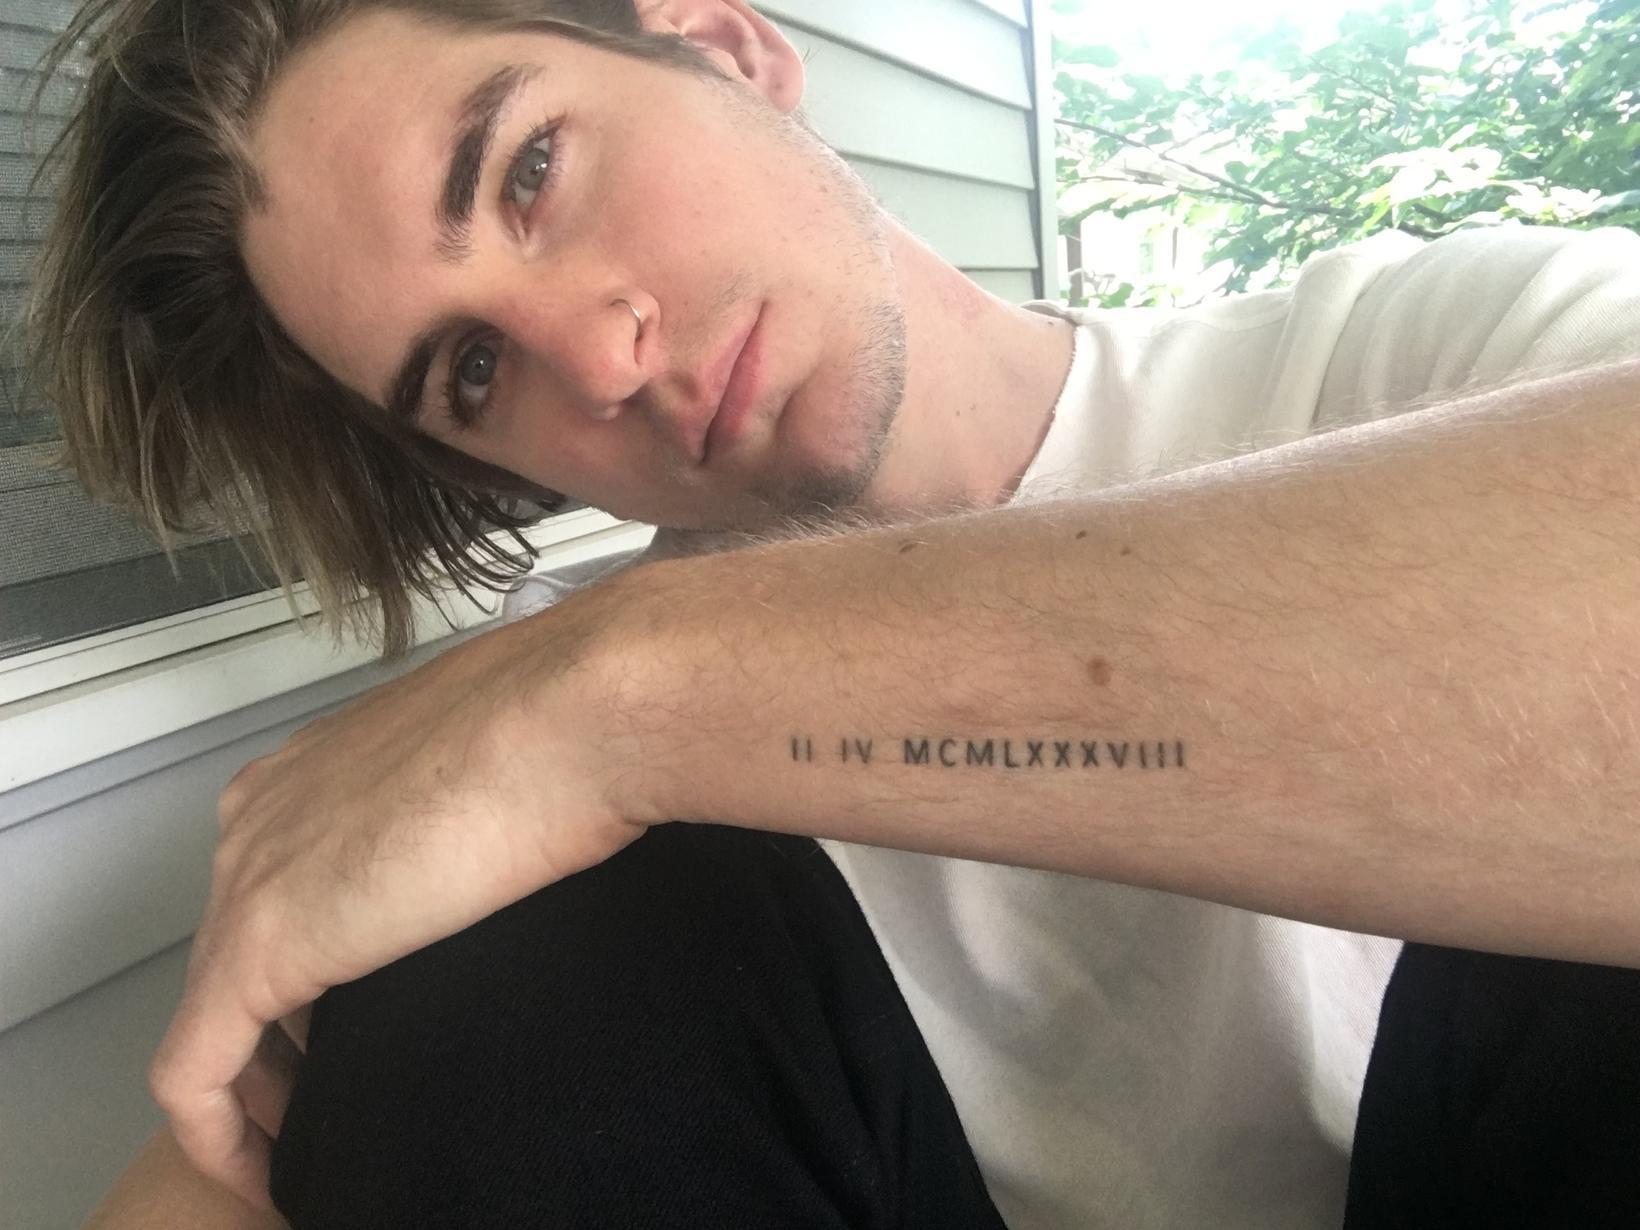 Dan from Minneapolis, Minnesota, United States